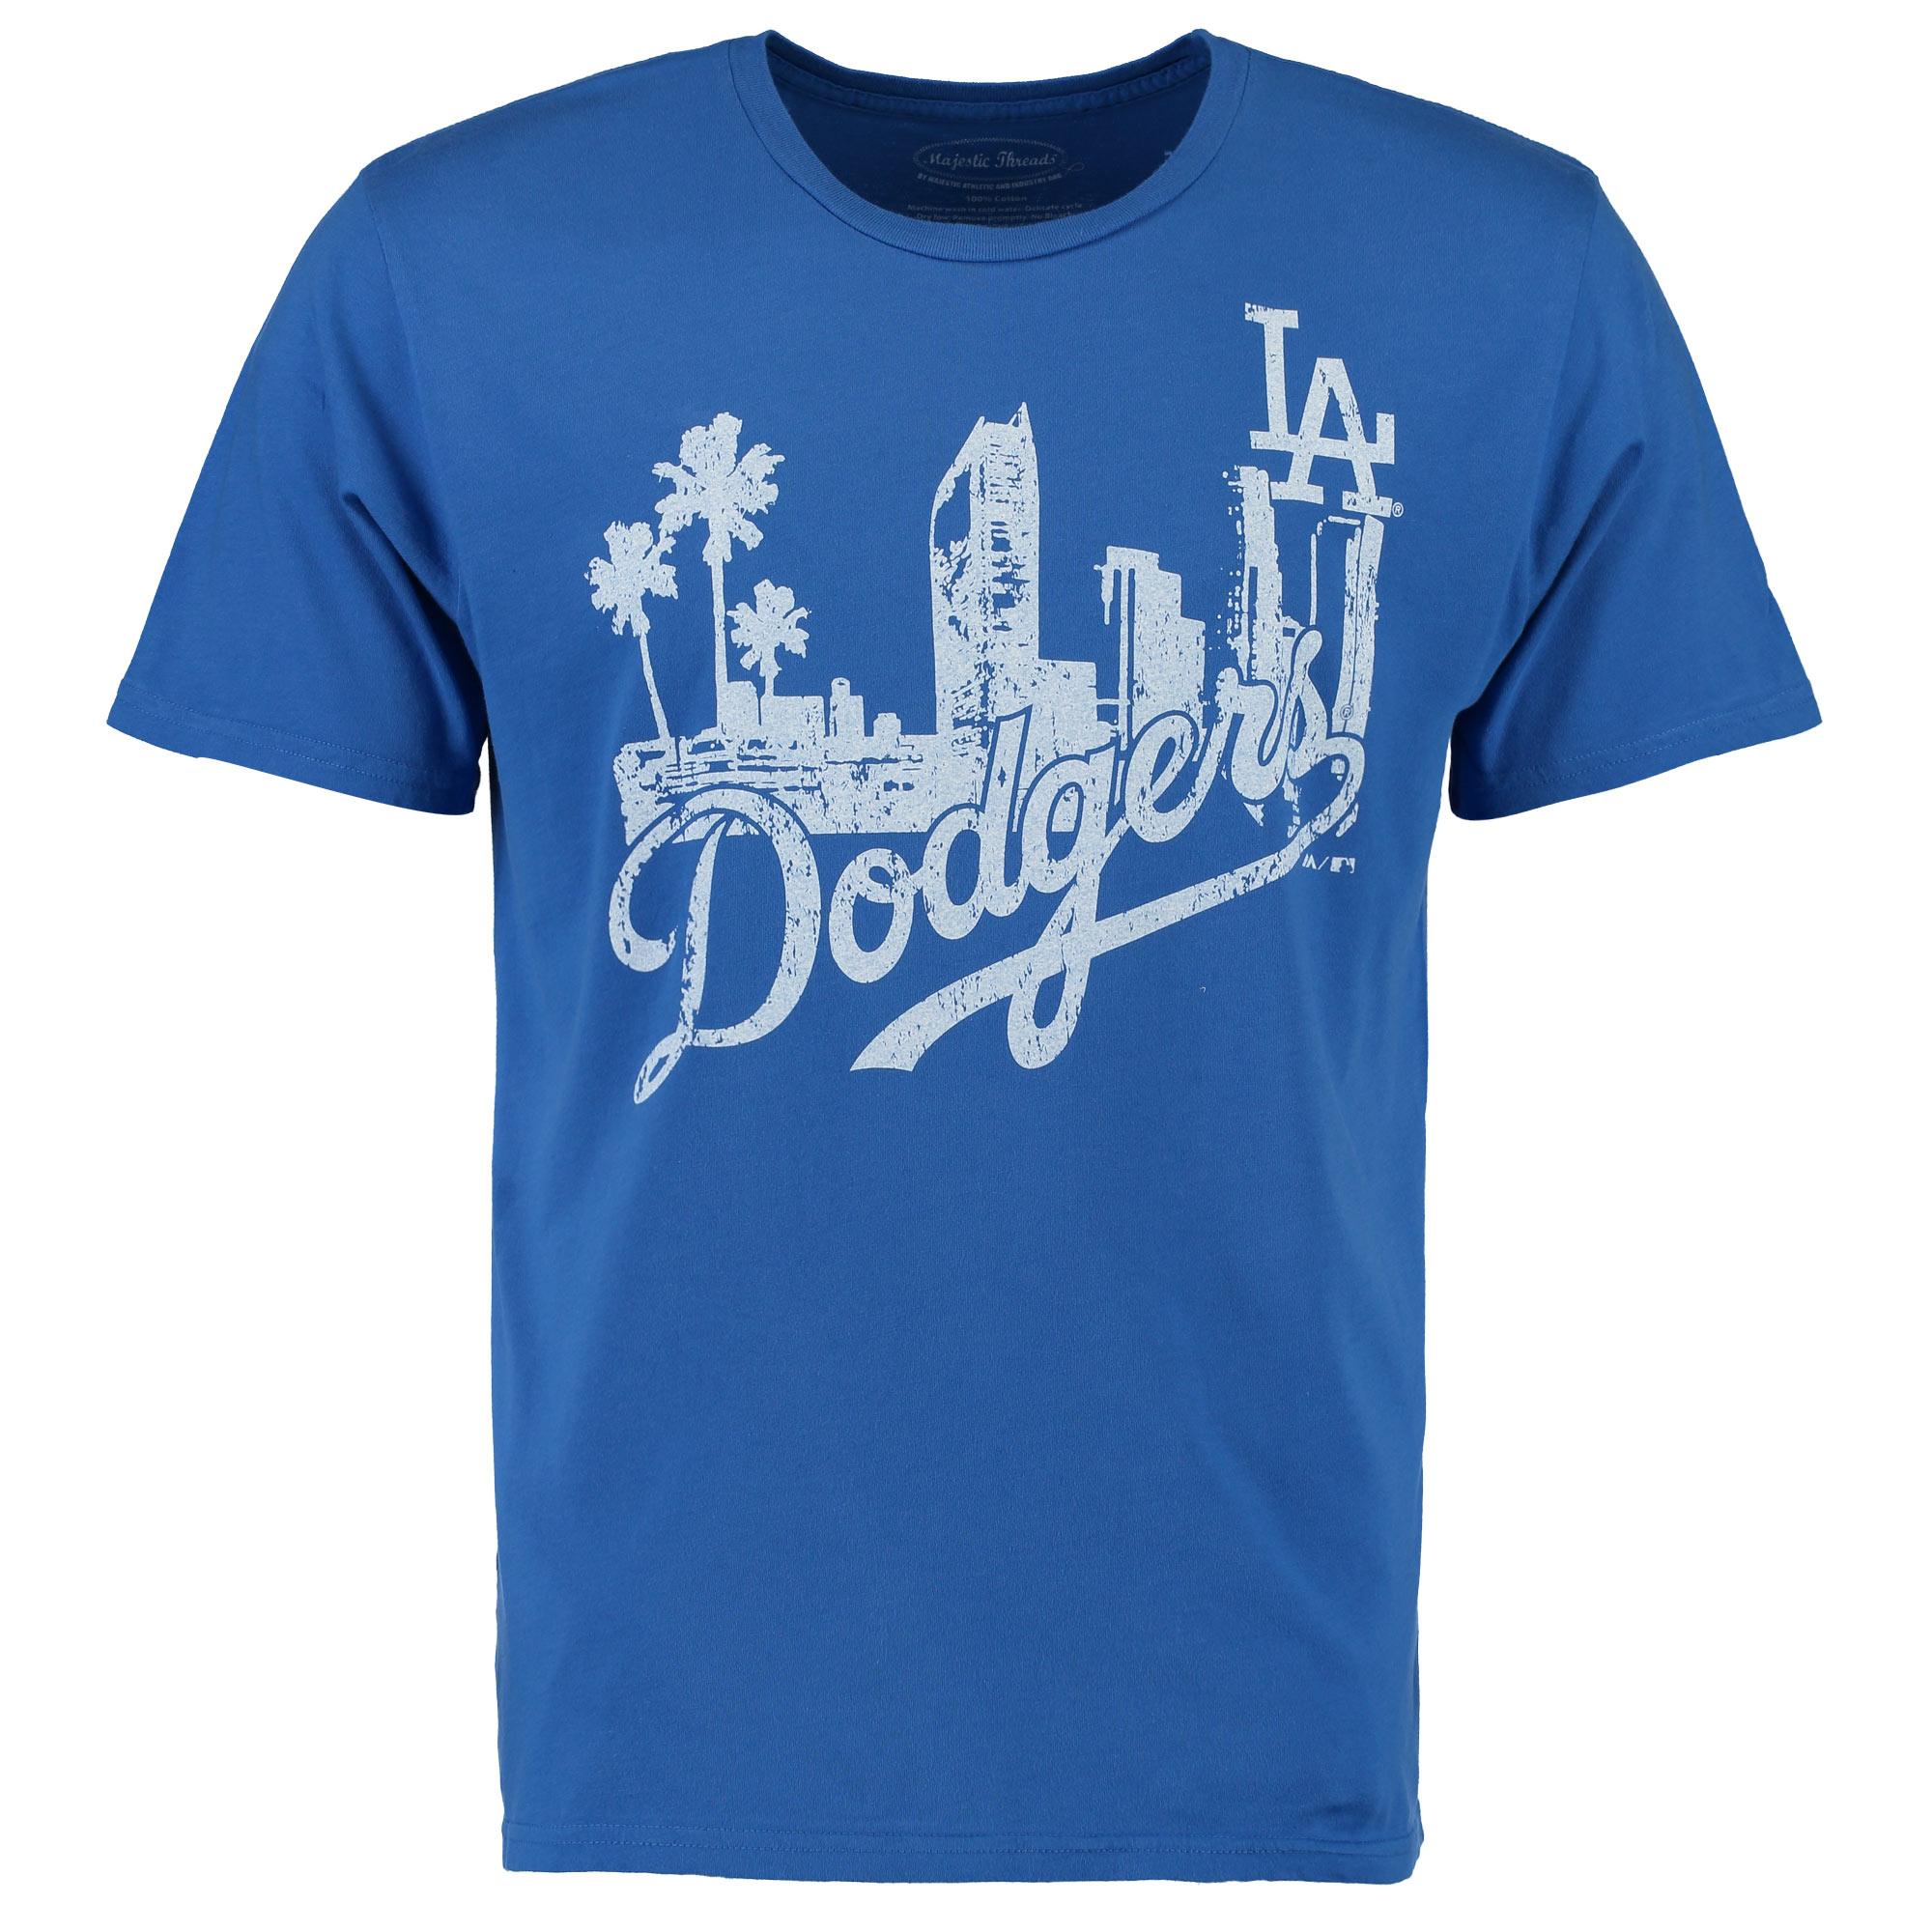 Los Angeles Dodgers Majestic Threads City Skyline Softhand T-Shirt - Royal